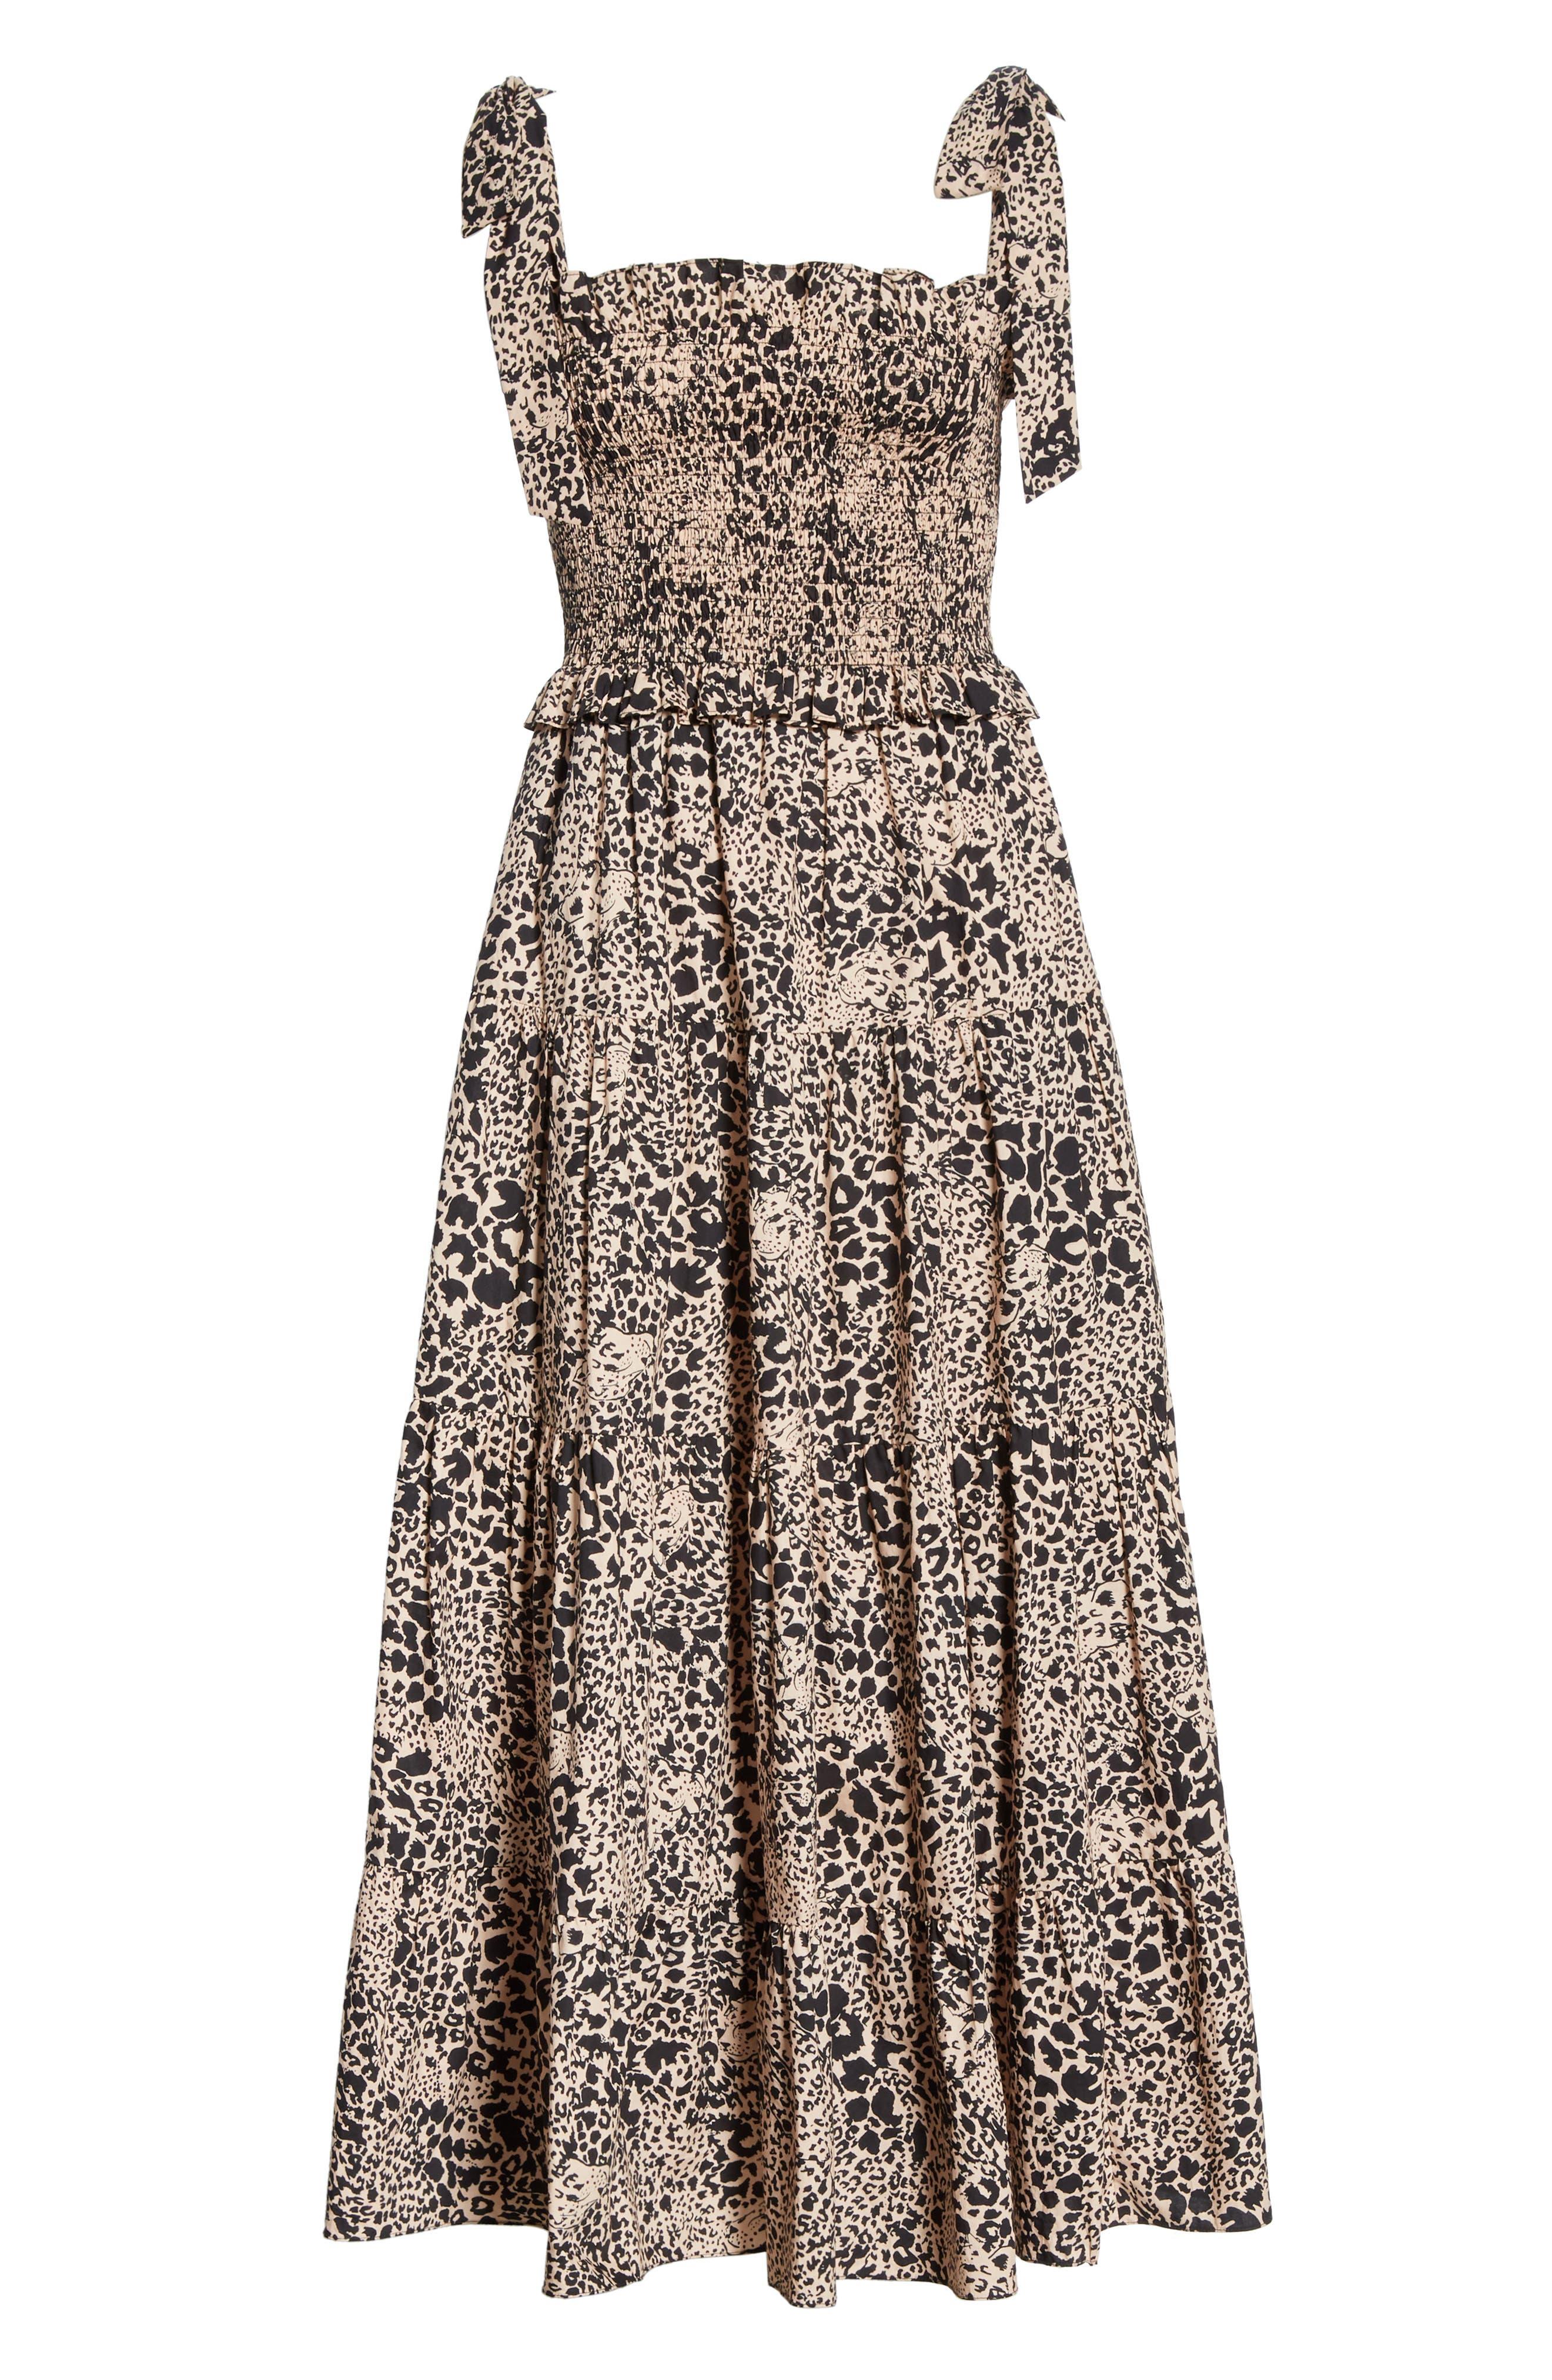 Leopard Print Smocked Dress,                             Alternate thumbnail 7, color,                             CHAMPAGNE COMBO